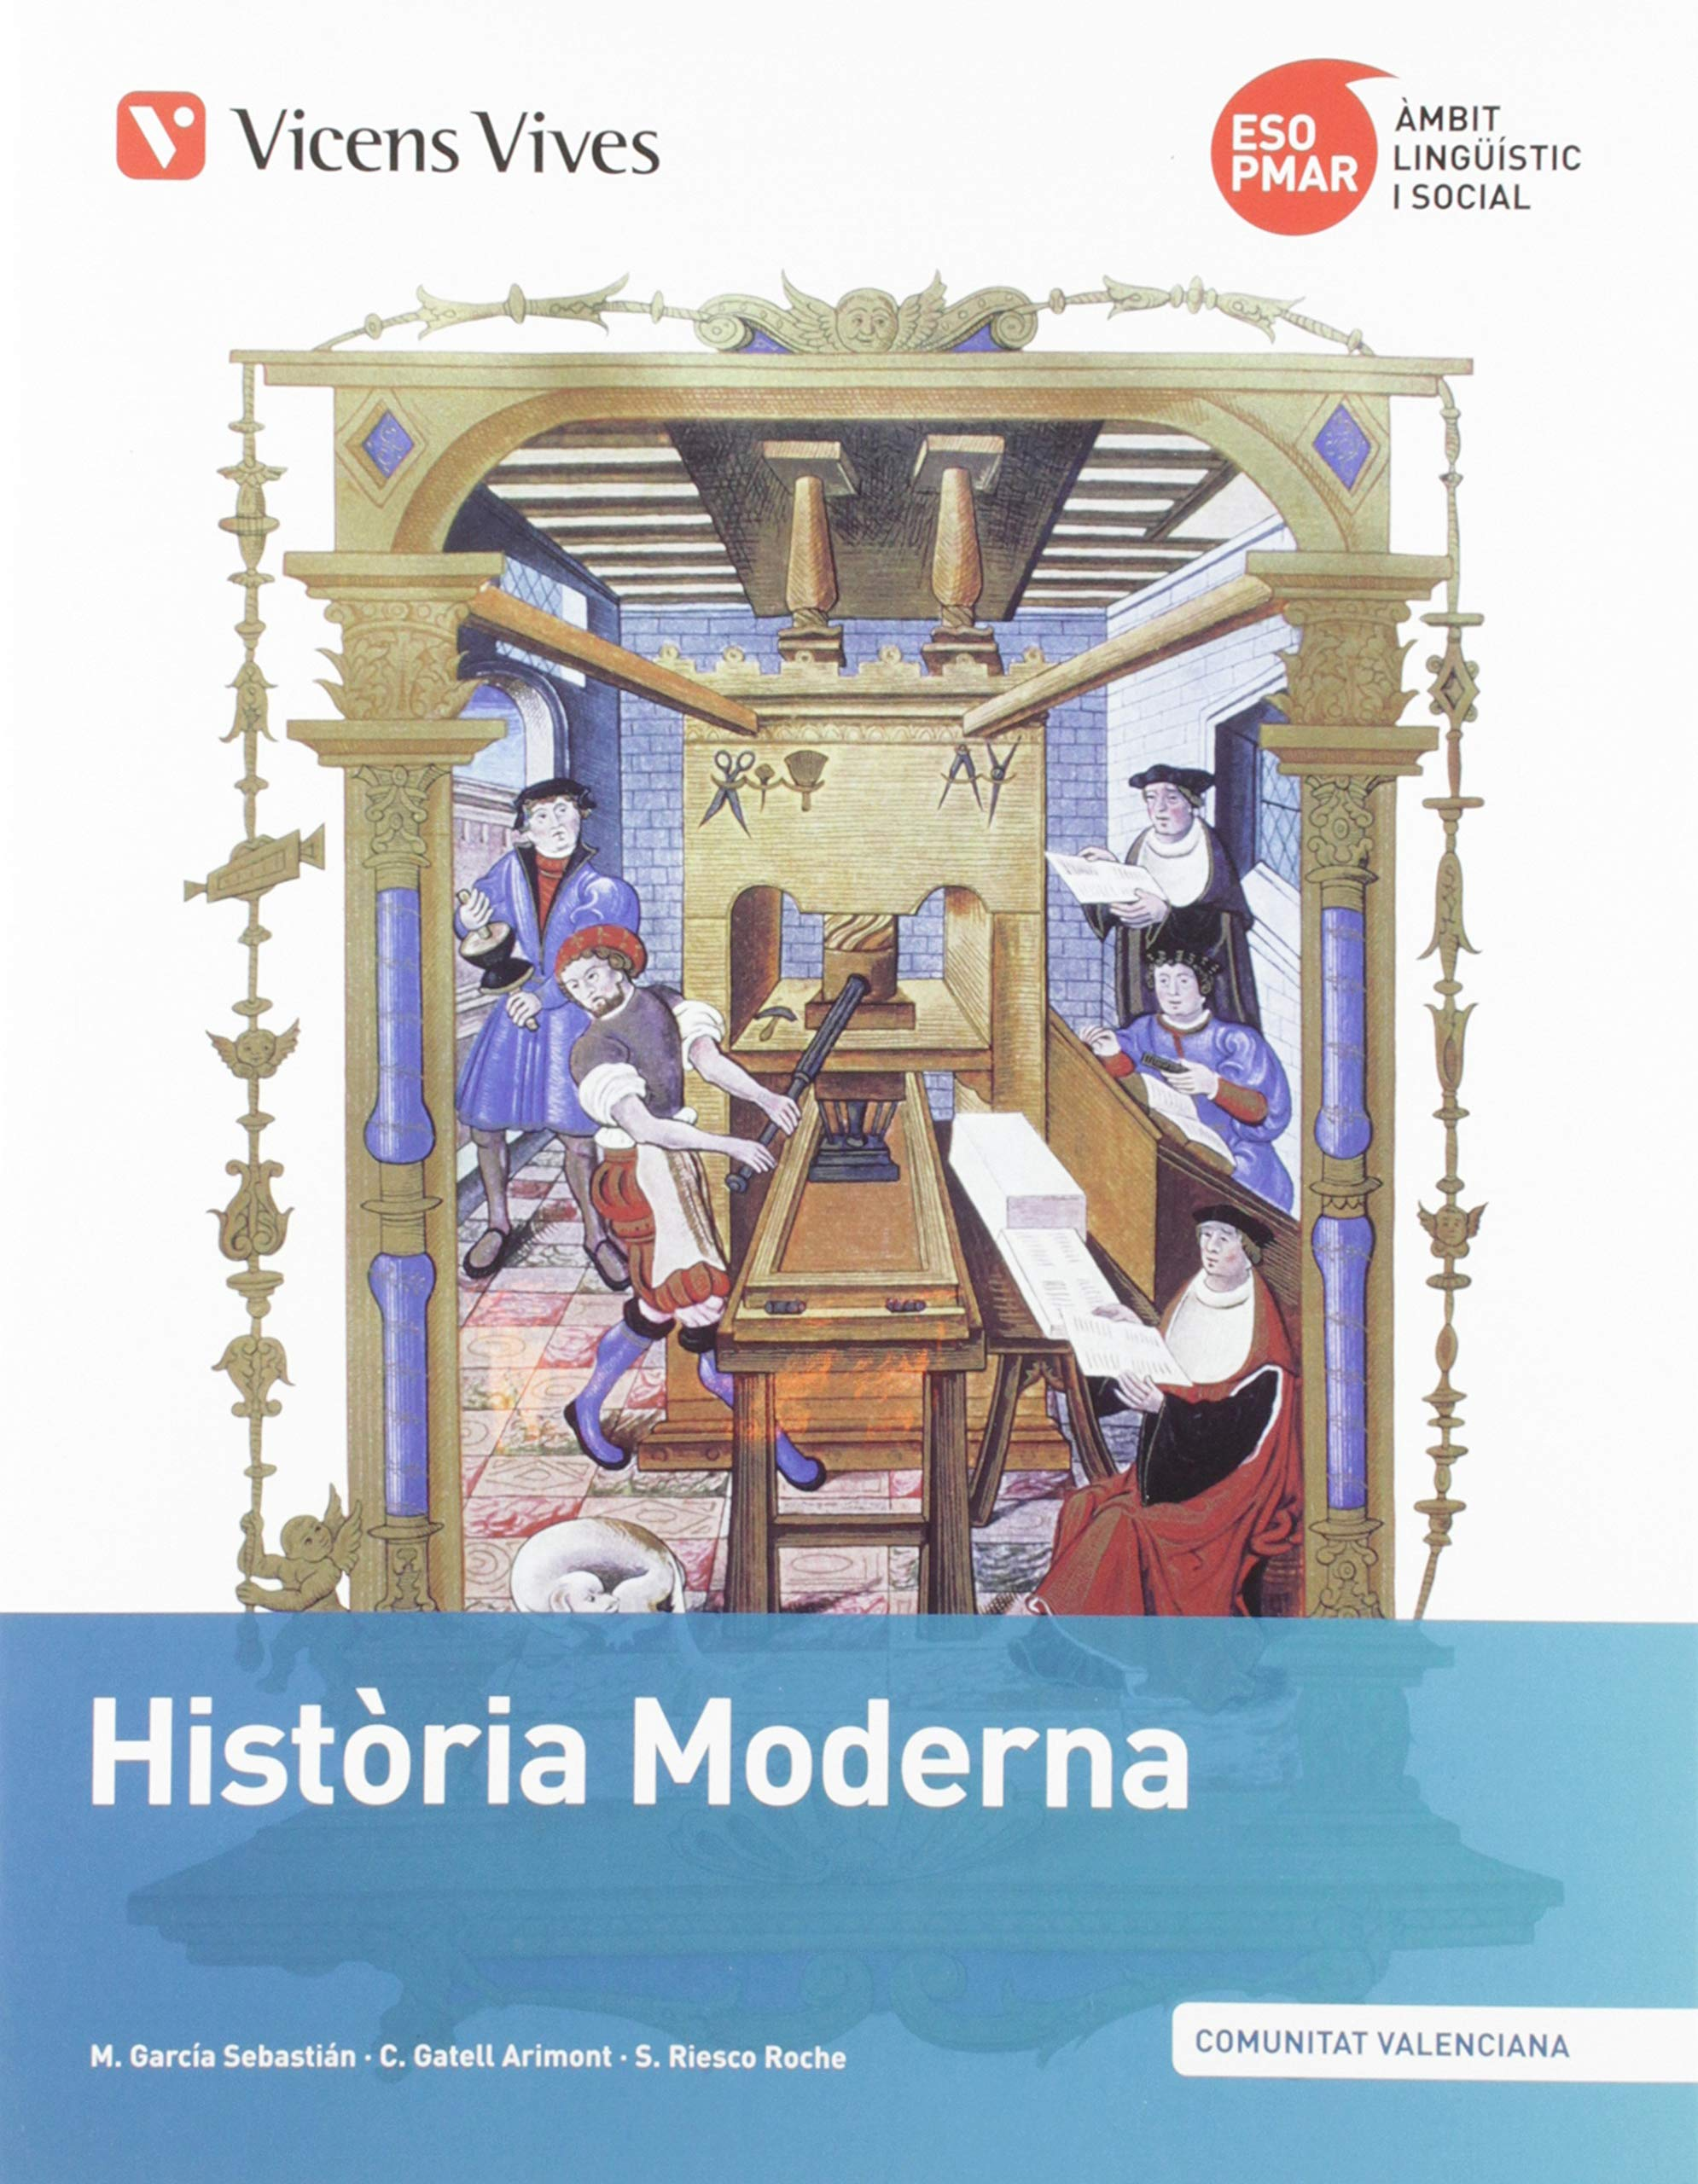 PMAR HISTORIA MODERNA VALENCIA: Amazon.es: Garcia Sebastian, Margarita, Gatell Arimont, Cristina, Riesco Roche, Sergio: Libros en idiomas extranjeros